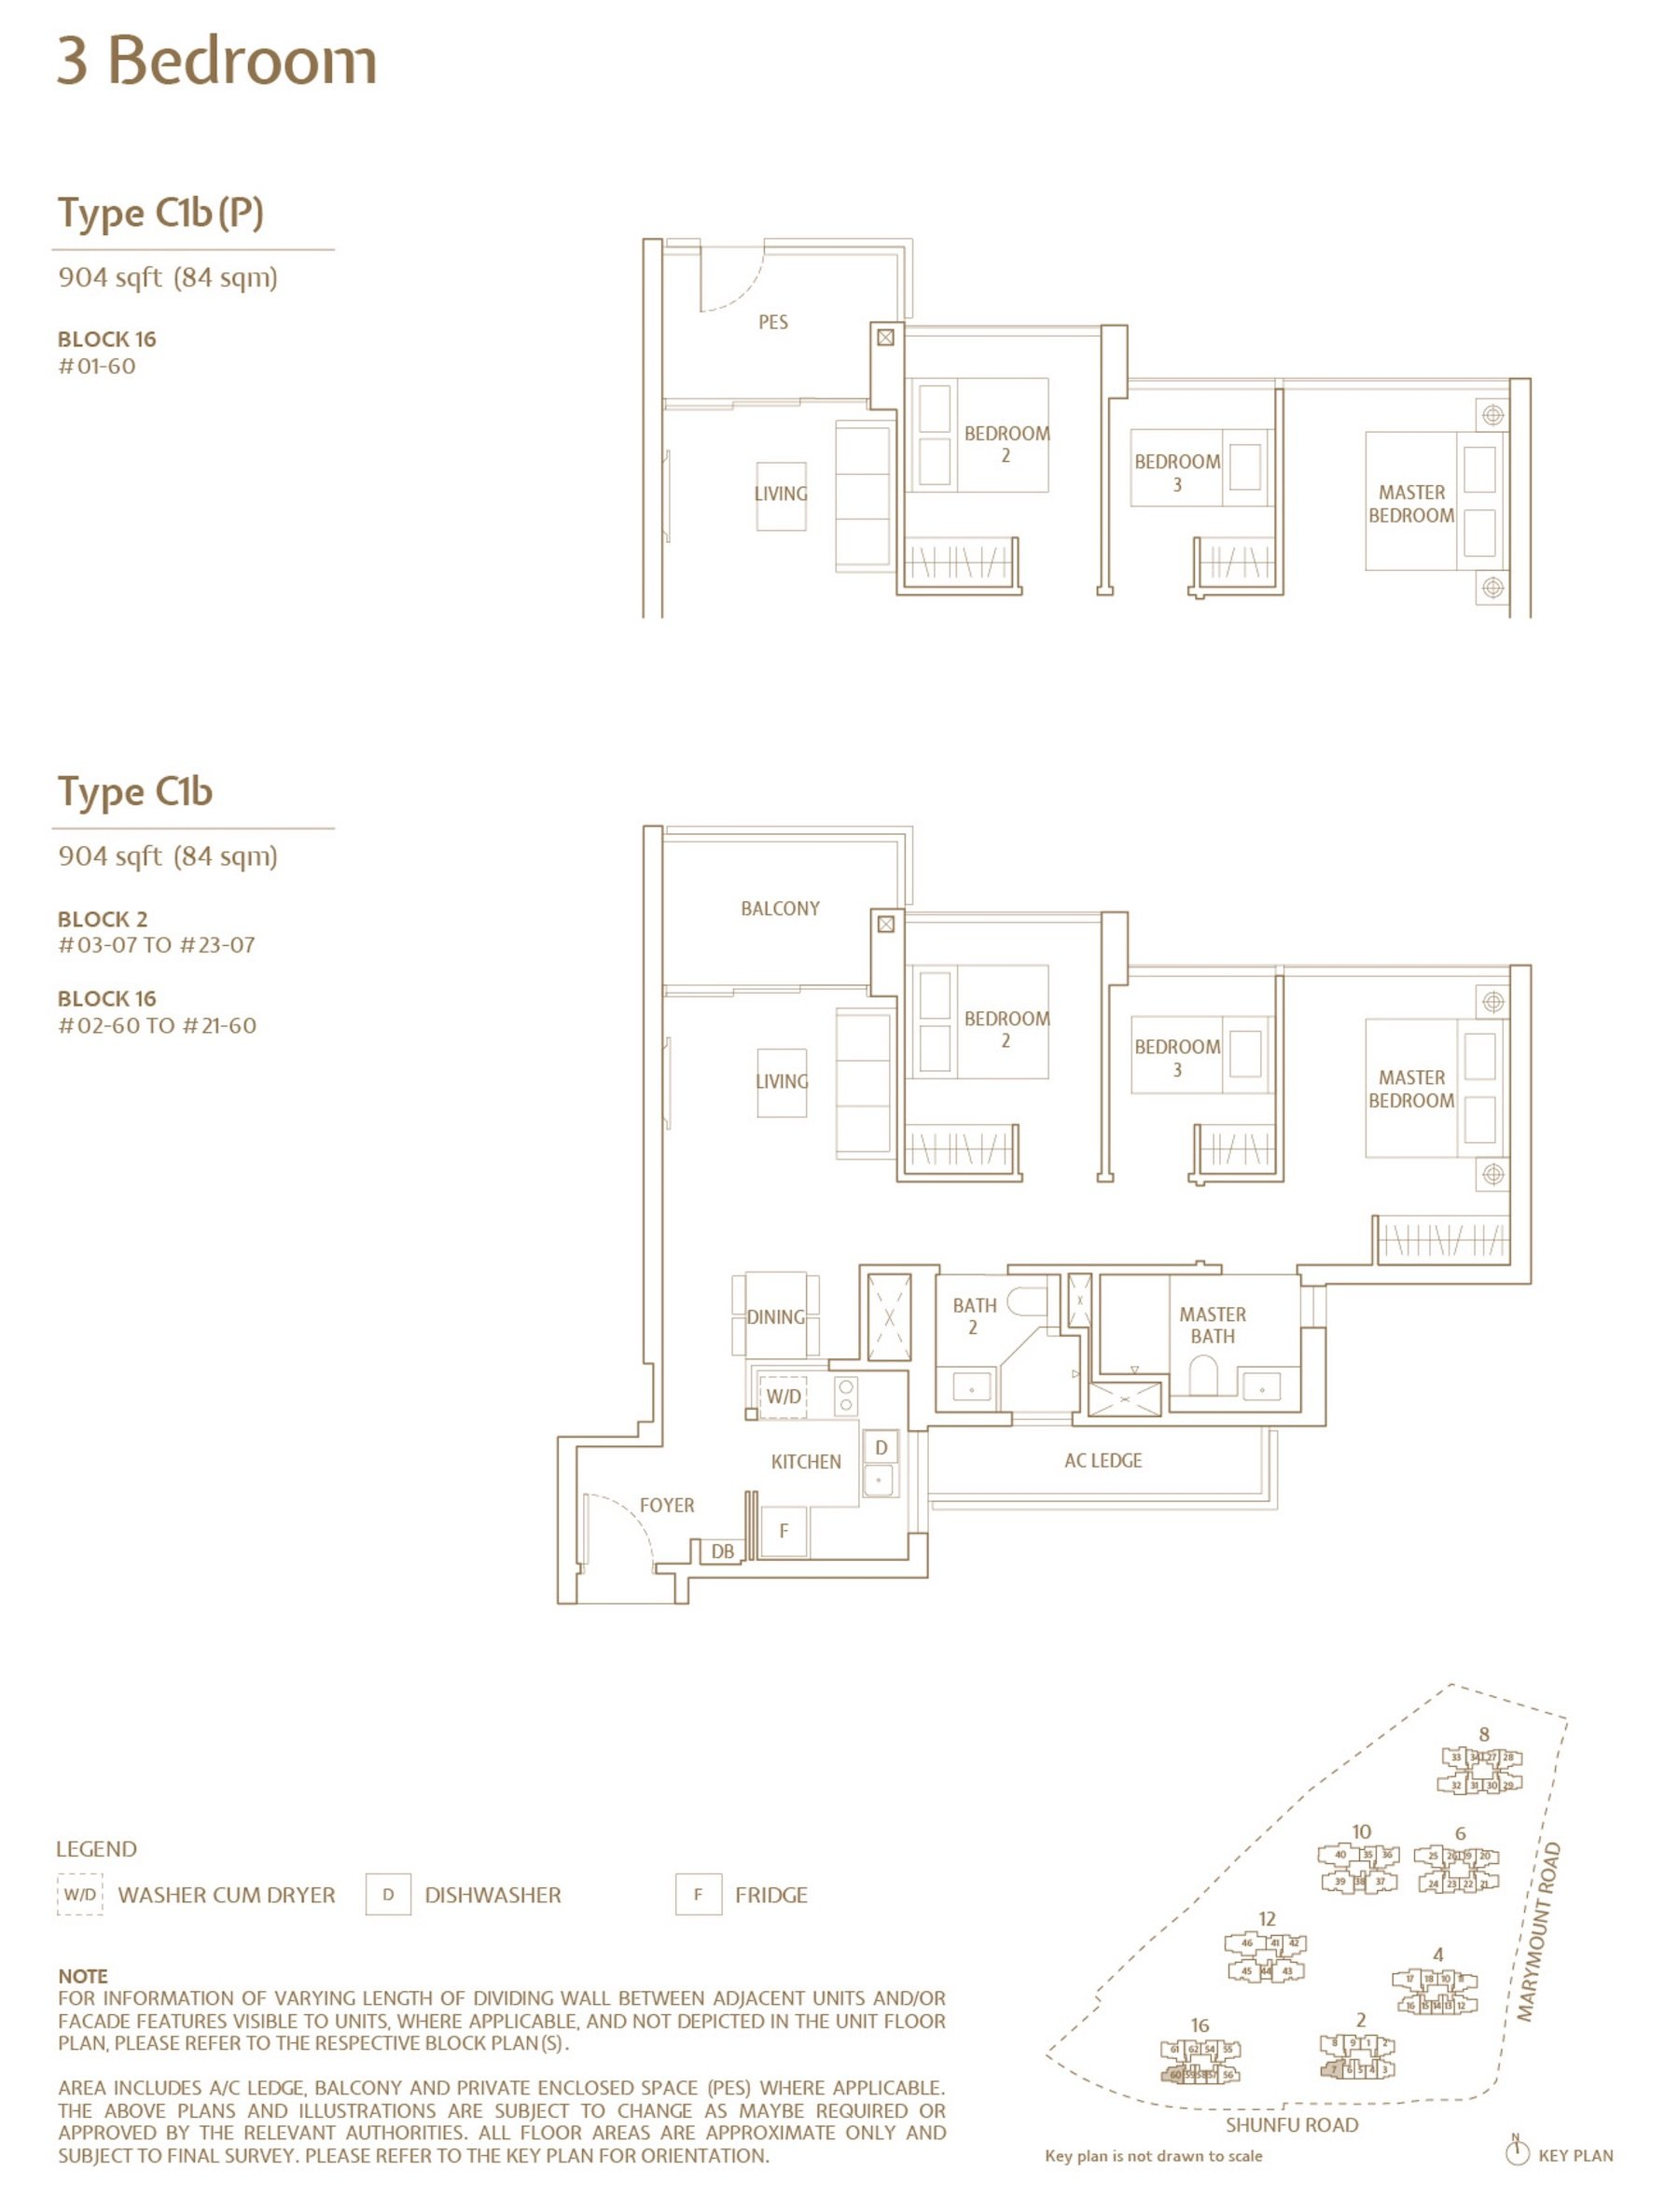 Jadescape 顺福轩 condo 3 bedroom type C1b